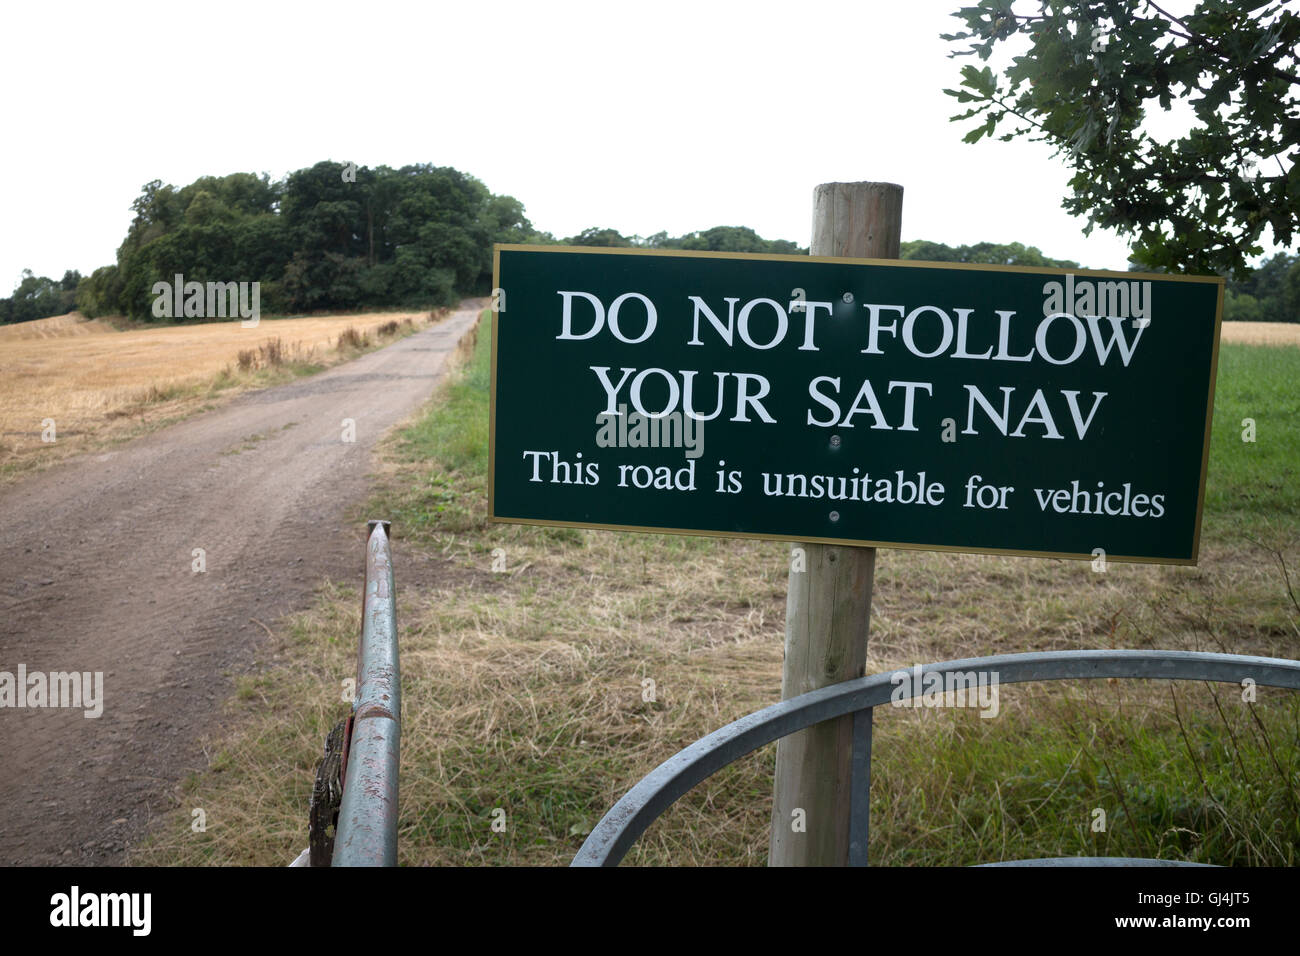 Sat Nav error warning by farm track, Warwickshire, UK - Stock Image